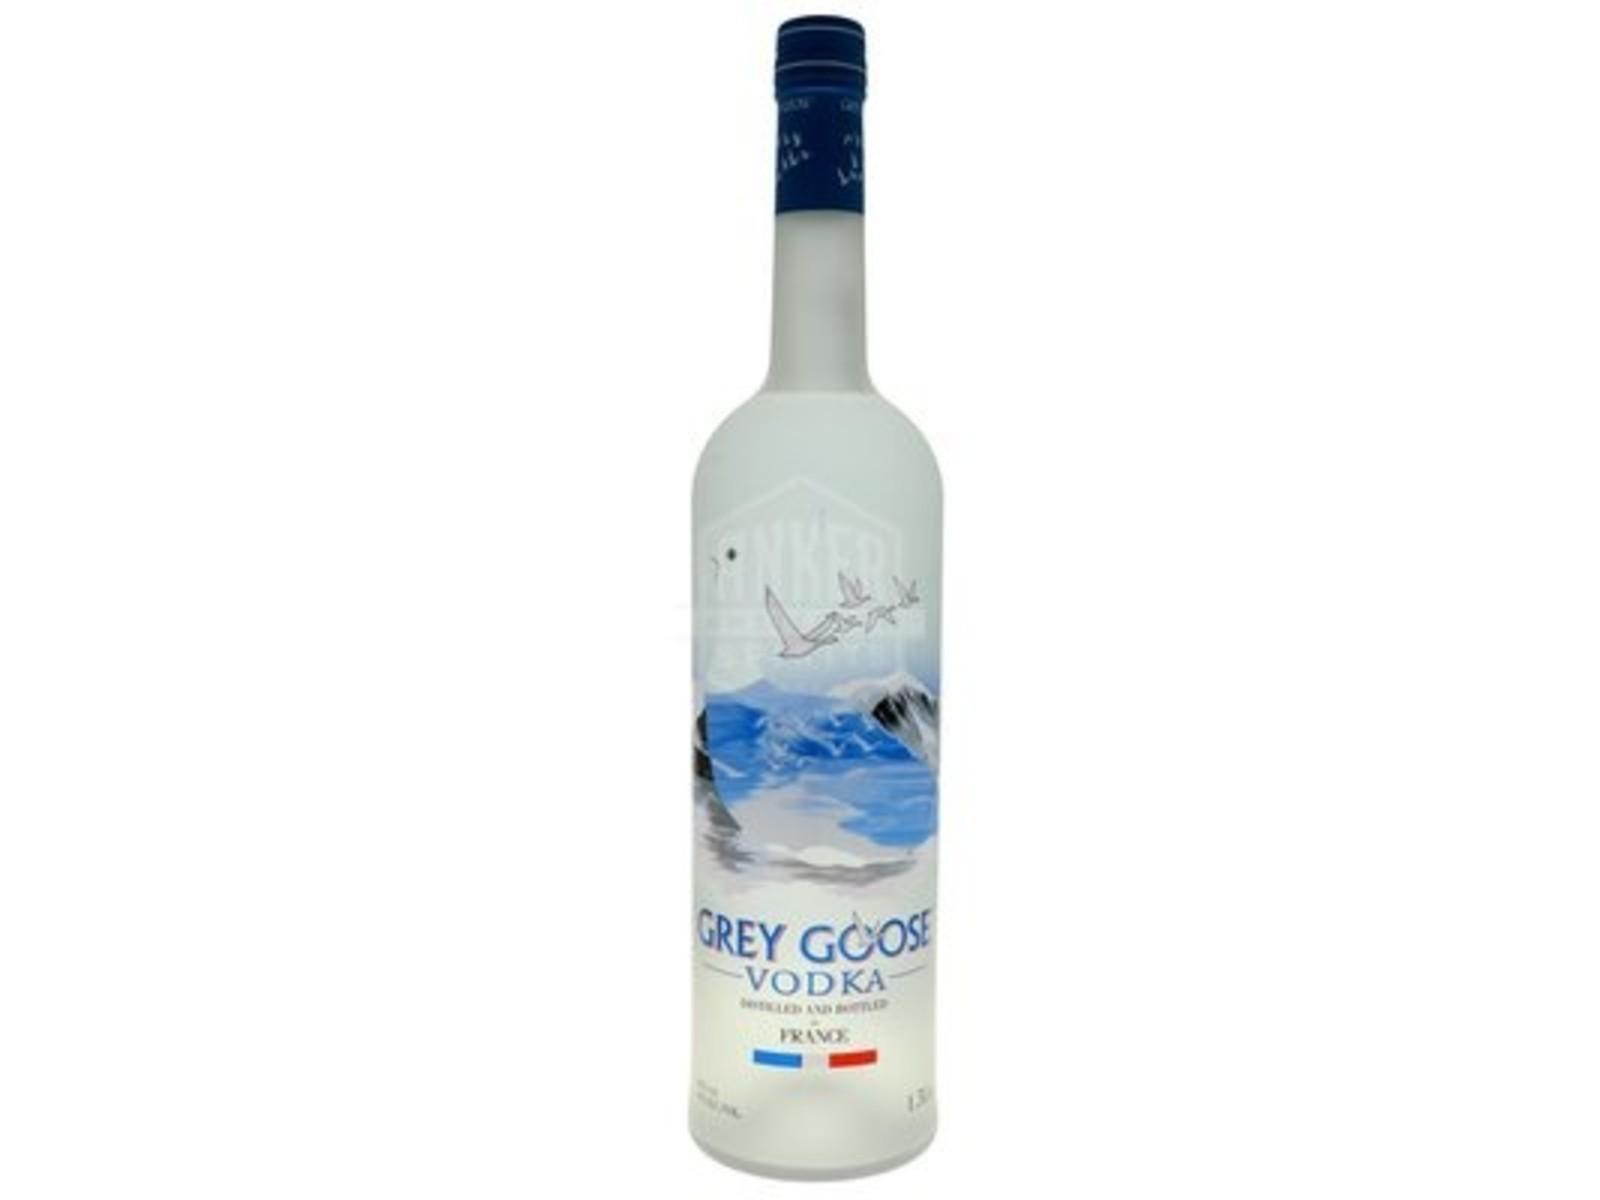 Grey Goose Grey Goose / Vodka / 1,5 Liter